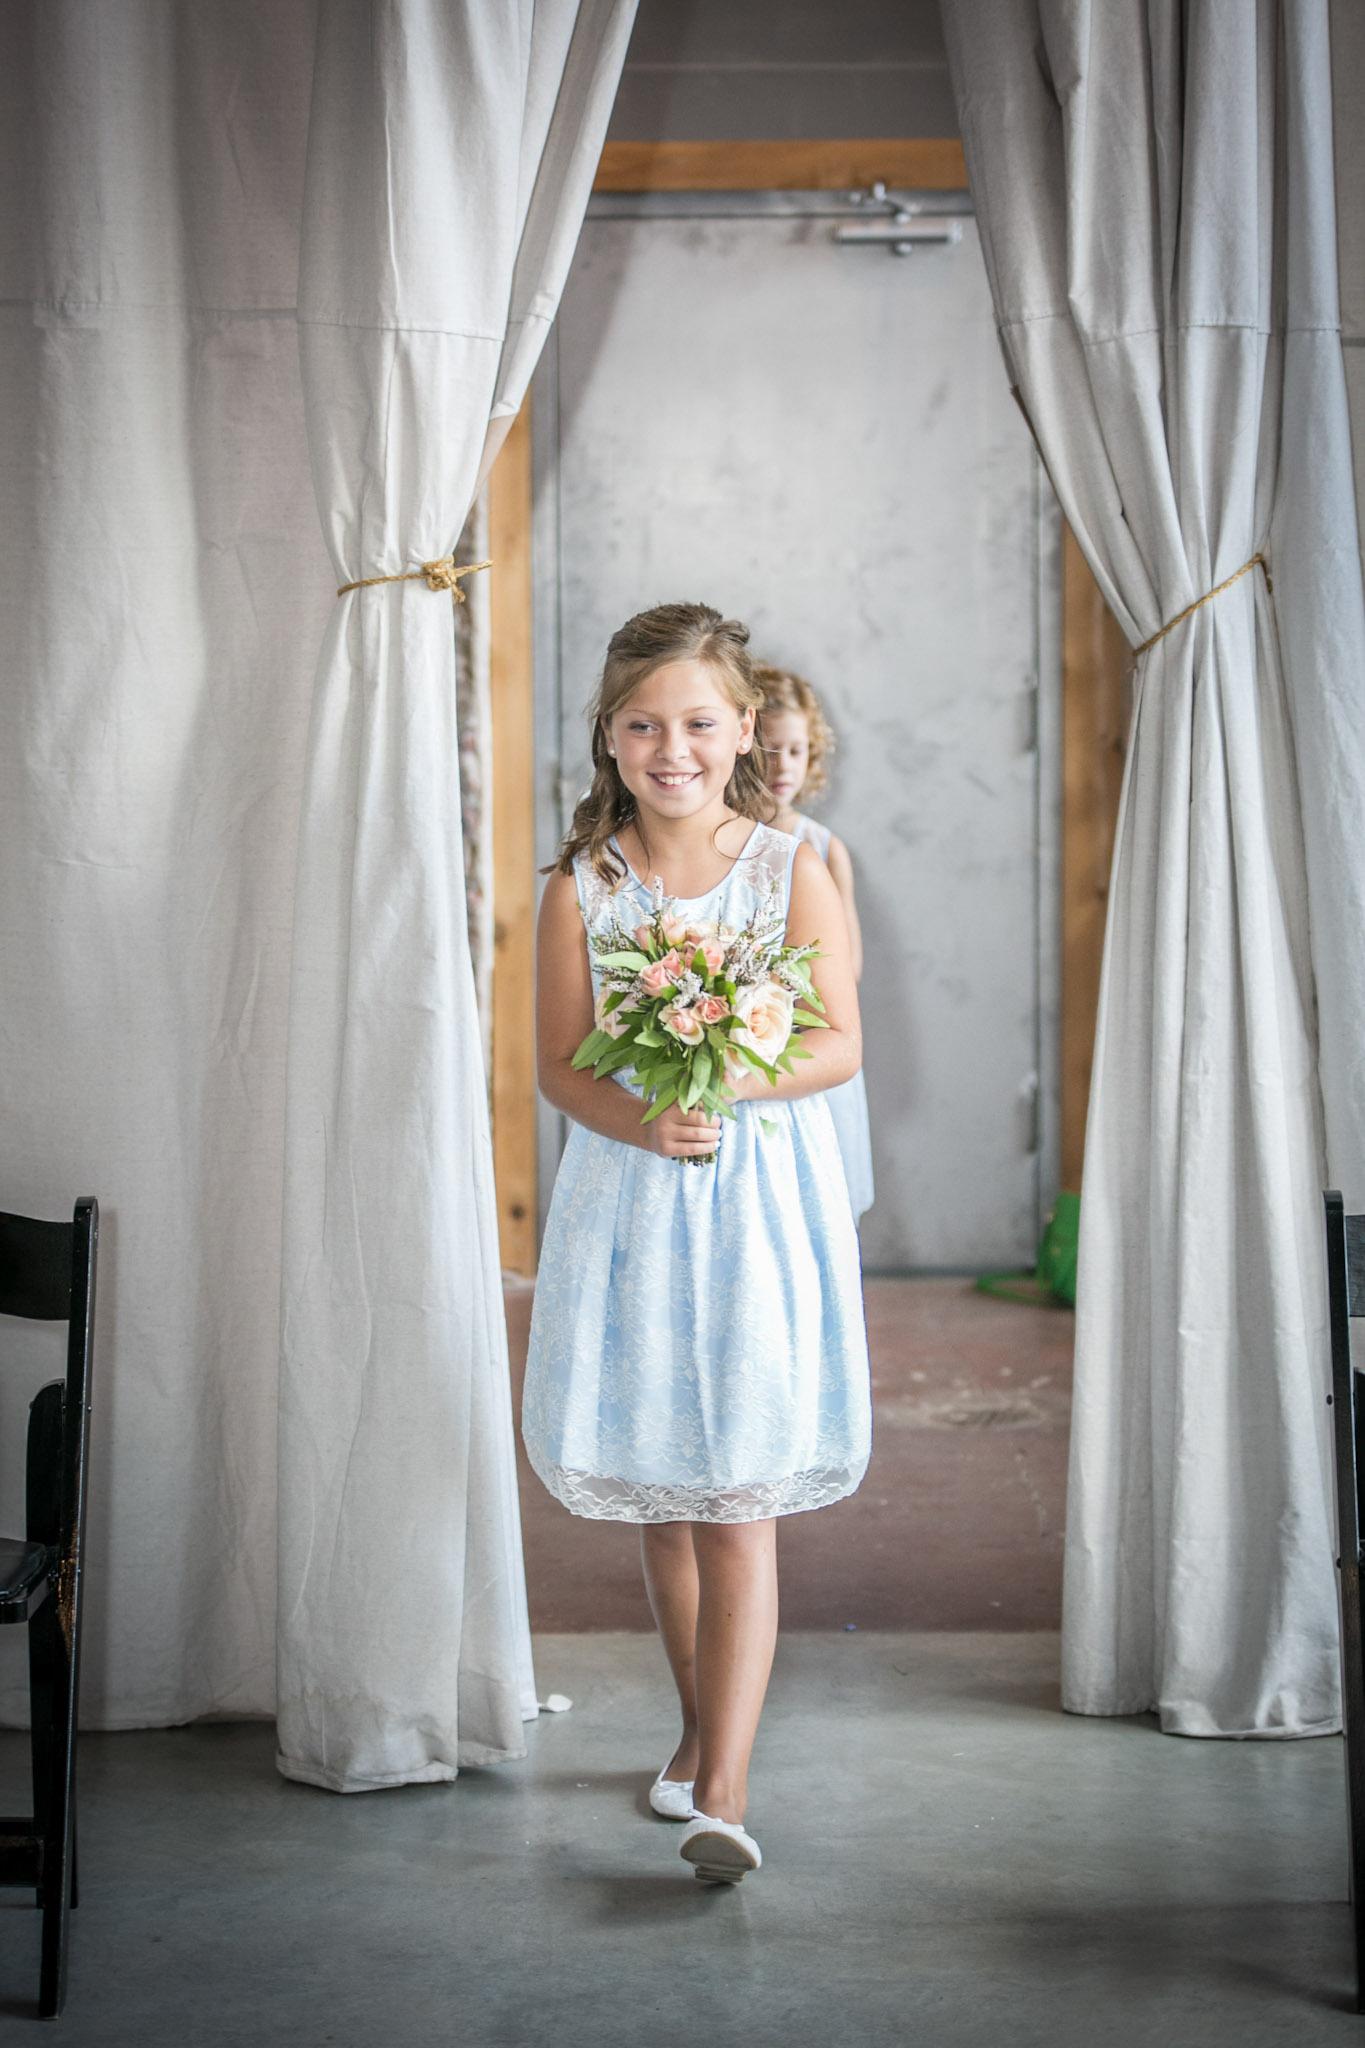 The_Vow_Exchange_Kansas_City_Small_Budget_Wedding_Venue_Lisa & John_033.jpg